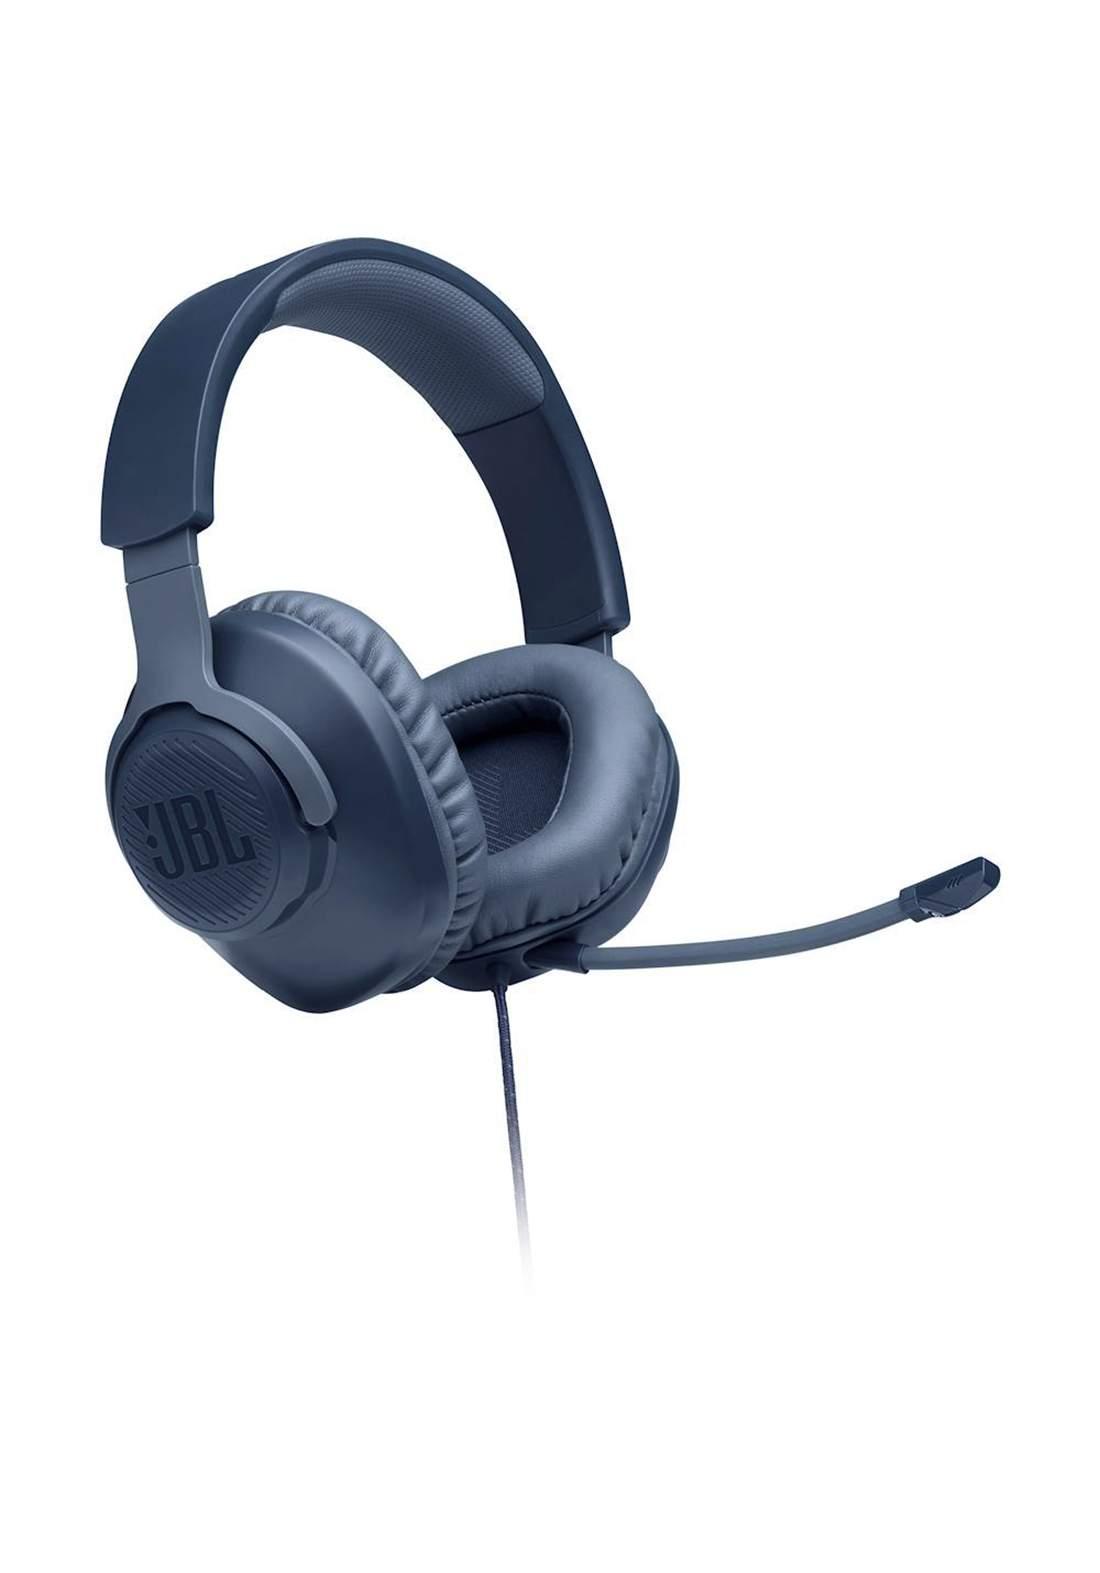 JBL Quantum 100 Wired Gaming Headset - Blue سماعة سلكية